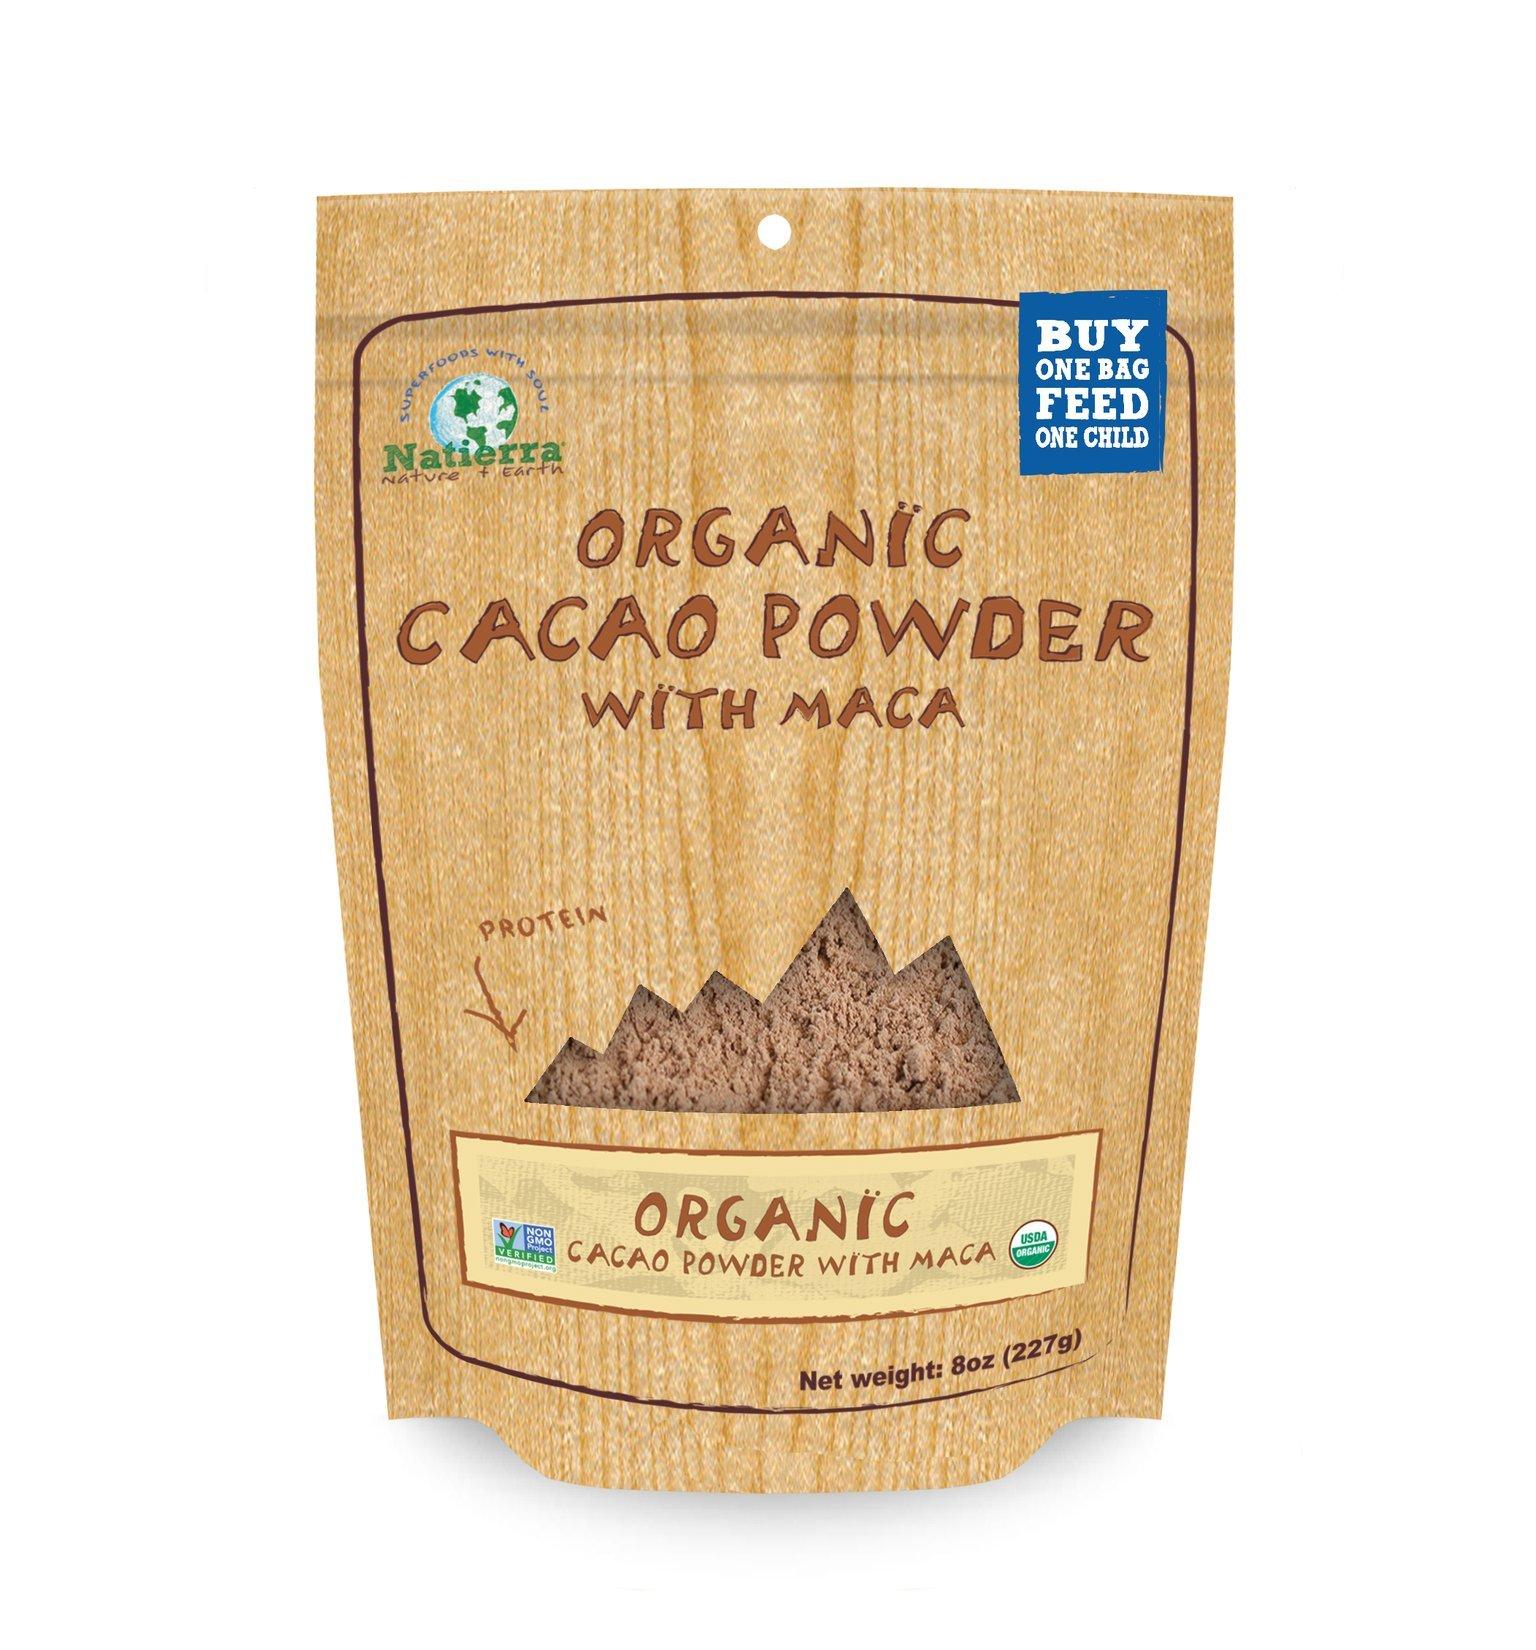 NATIERRA HimalaniaOrganic Cacao Powder with Maca Pouch | Non-GMO & Vegan  | 8 Ounce